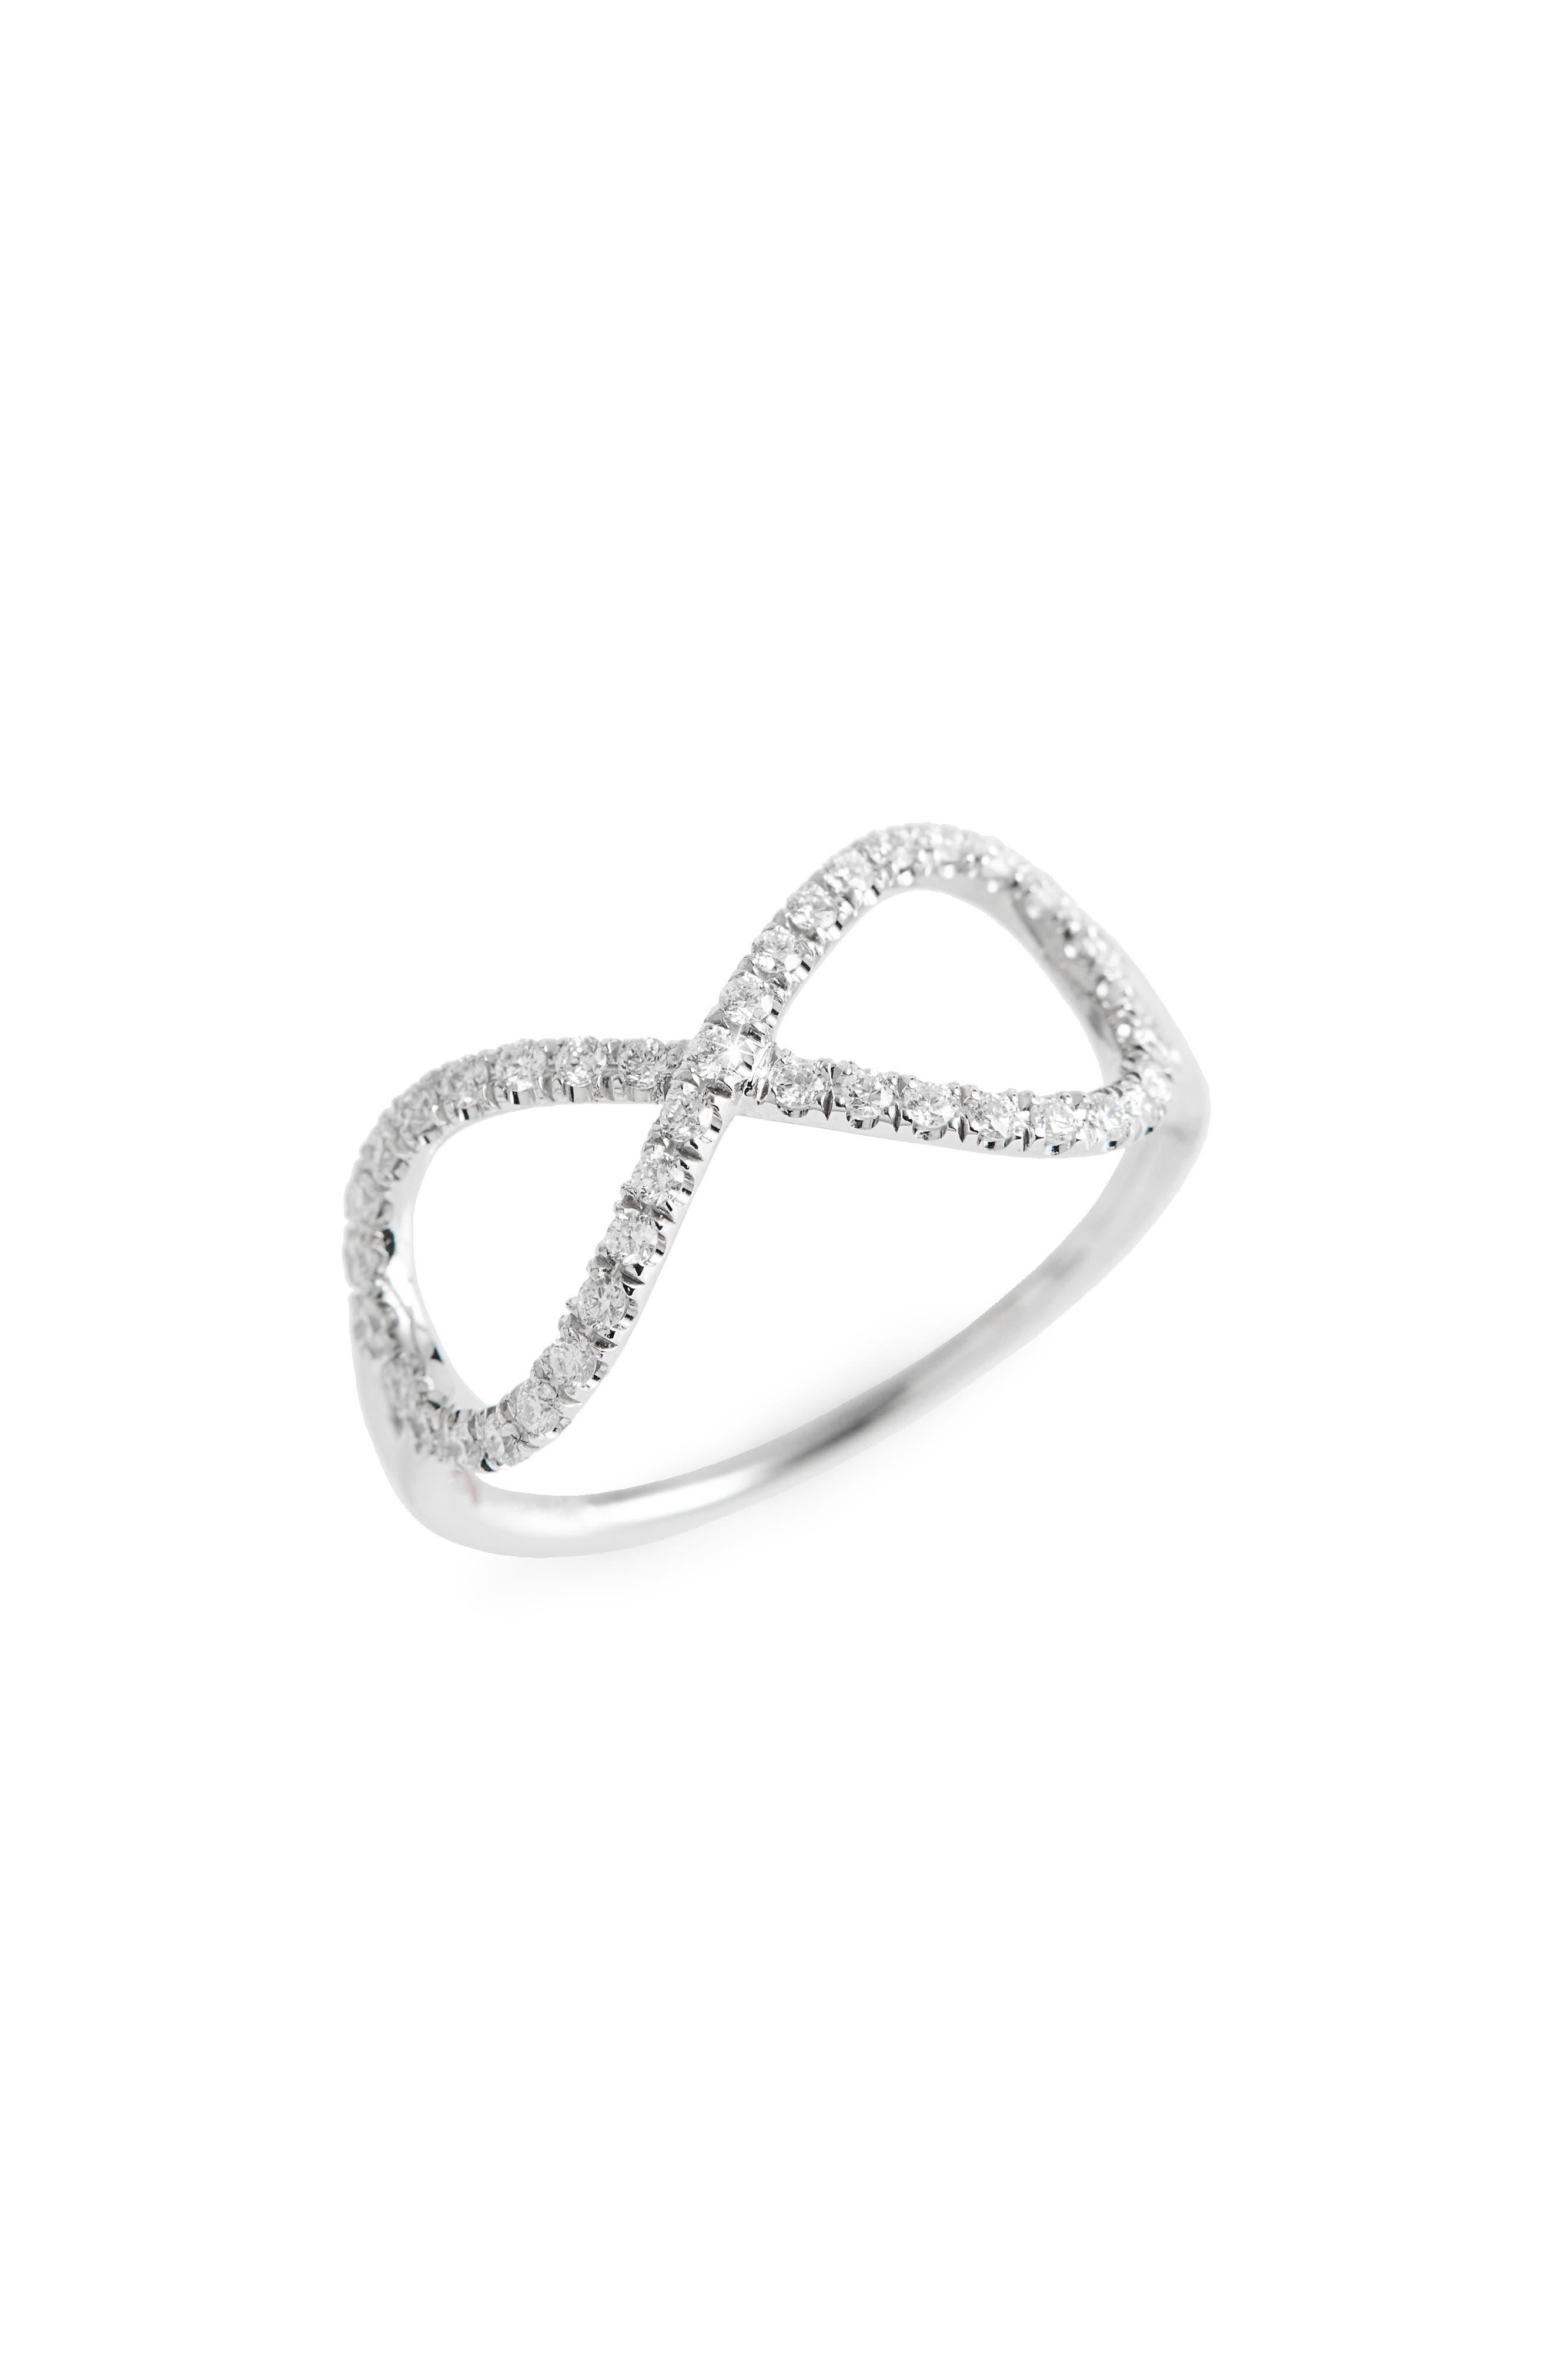 Diamond Infinity Ring,                             Main thumbnail 1, color,                             White Gold